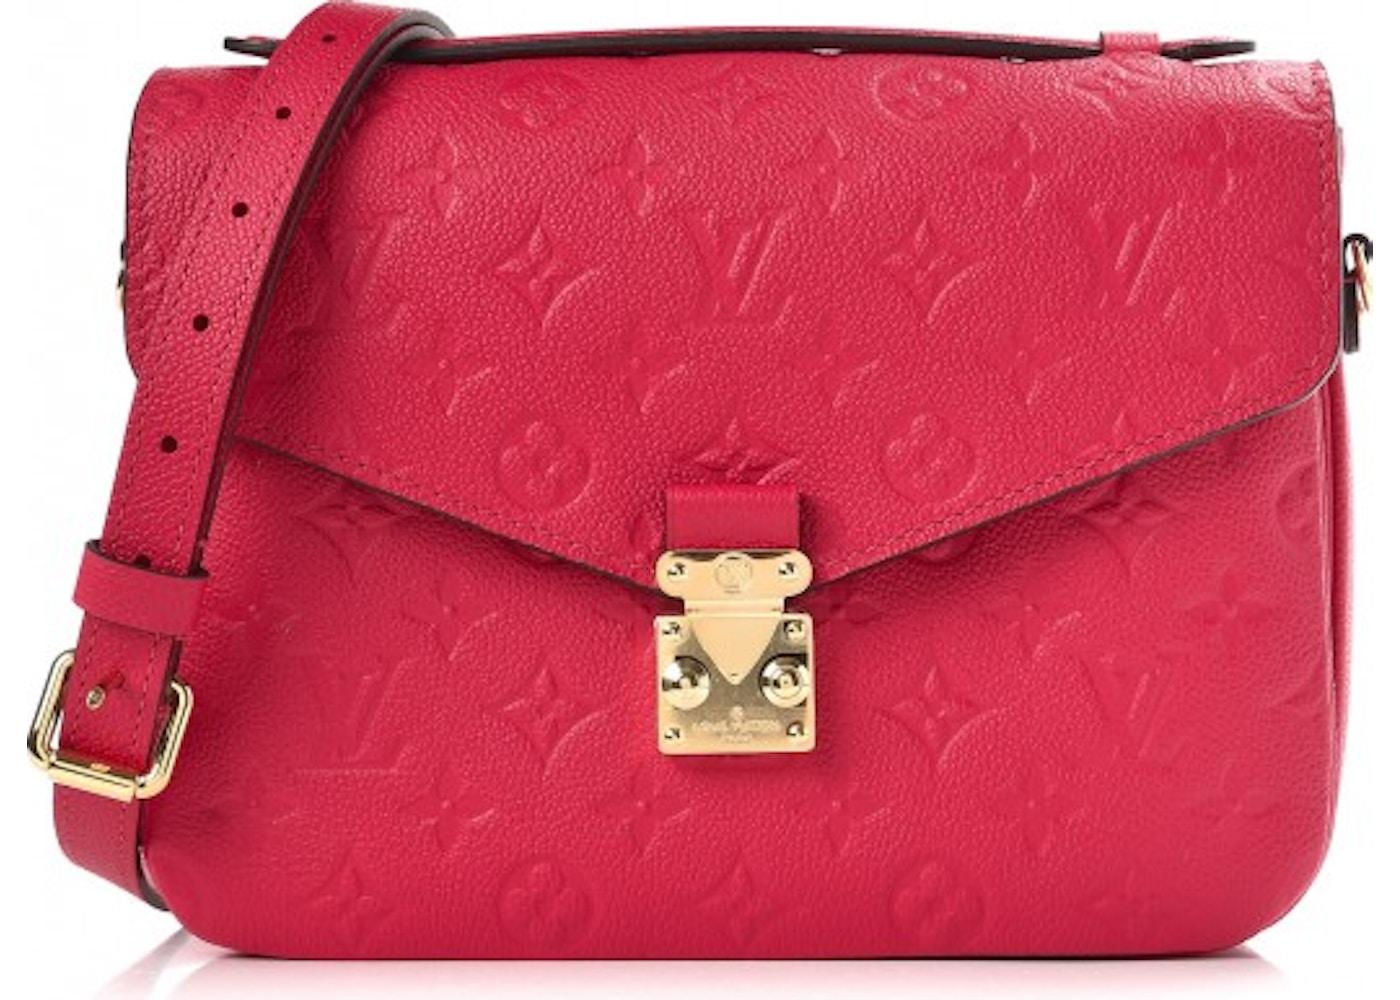 4e3d20b1f1f3 Louis Vuitton Pochette Metis Monogram Empreinte Freesia. Monogram Empreinte  Freesia